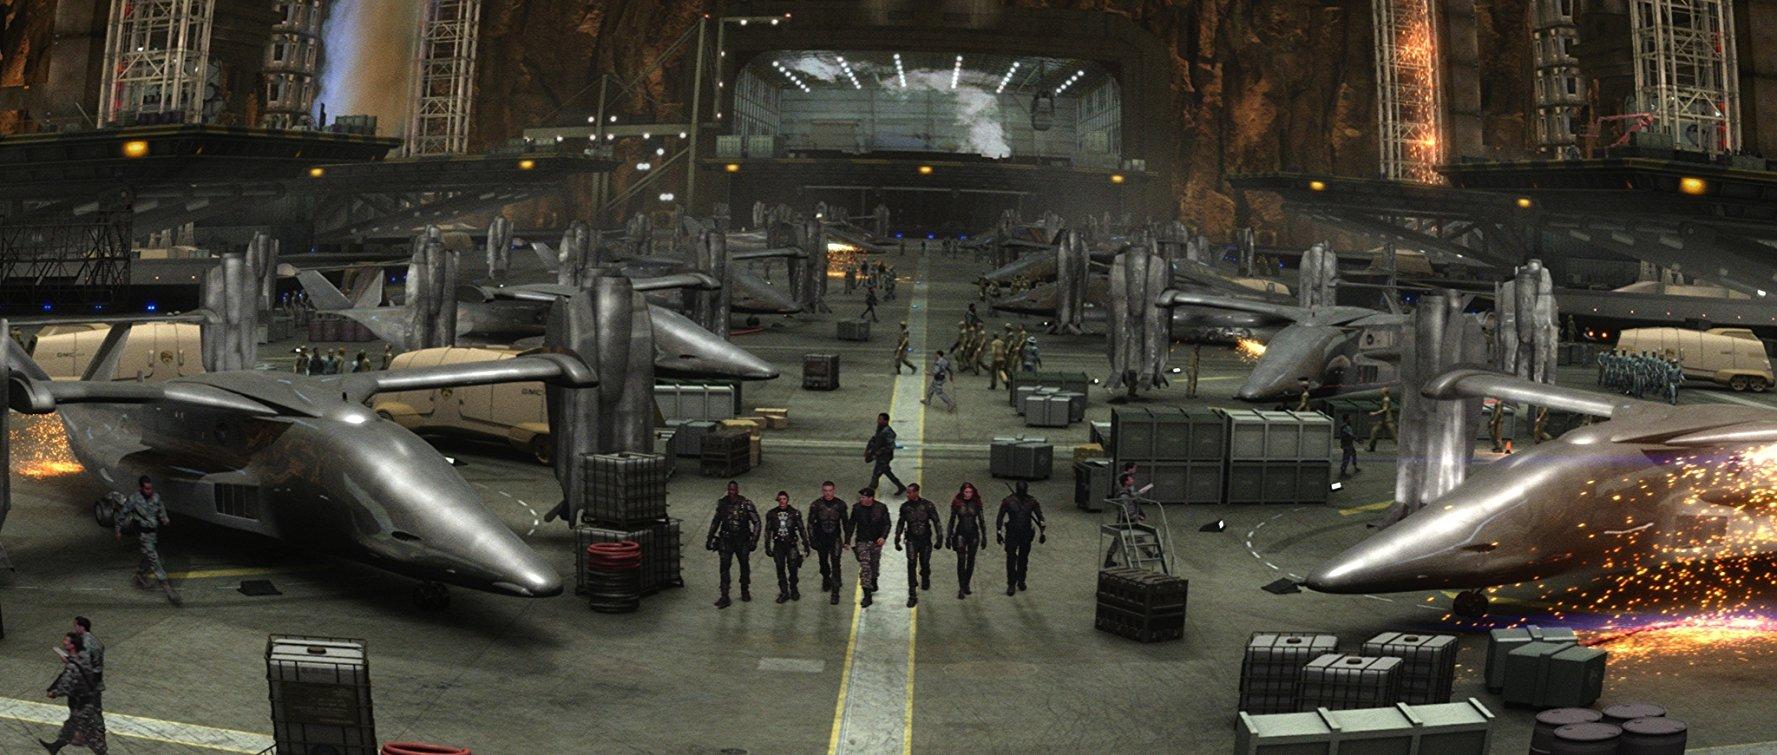 The G.I. Joe base in G.I. Joe: The Rise of the Cobra (2009)